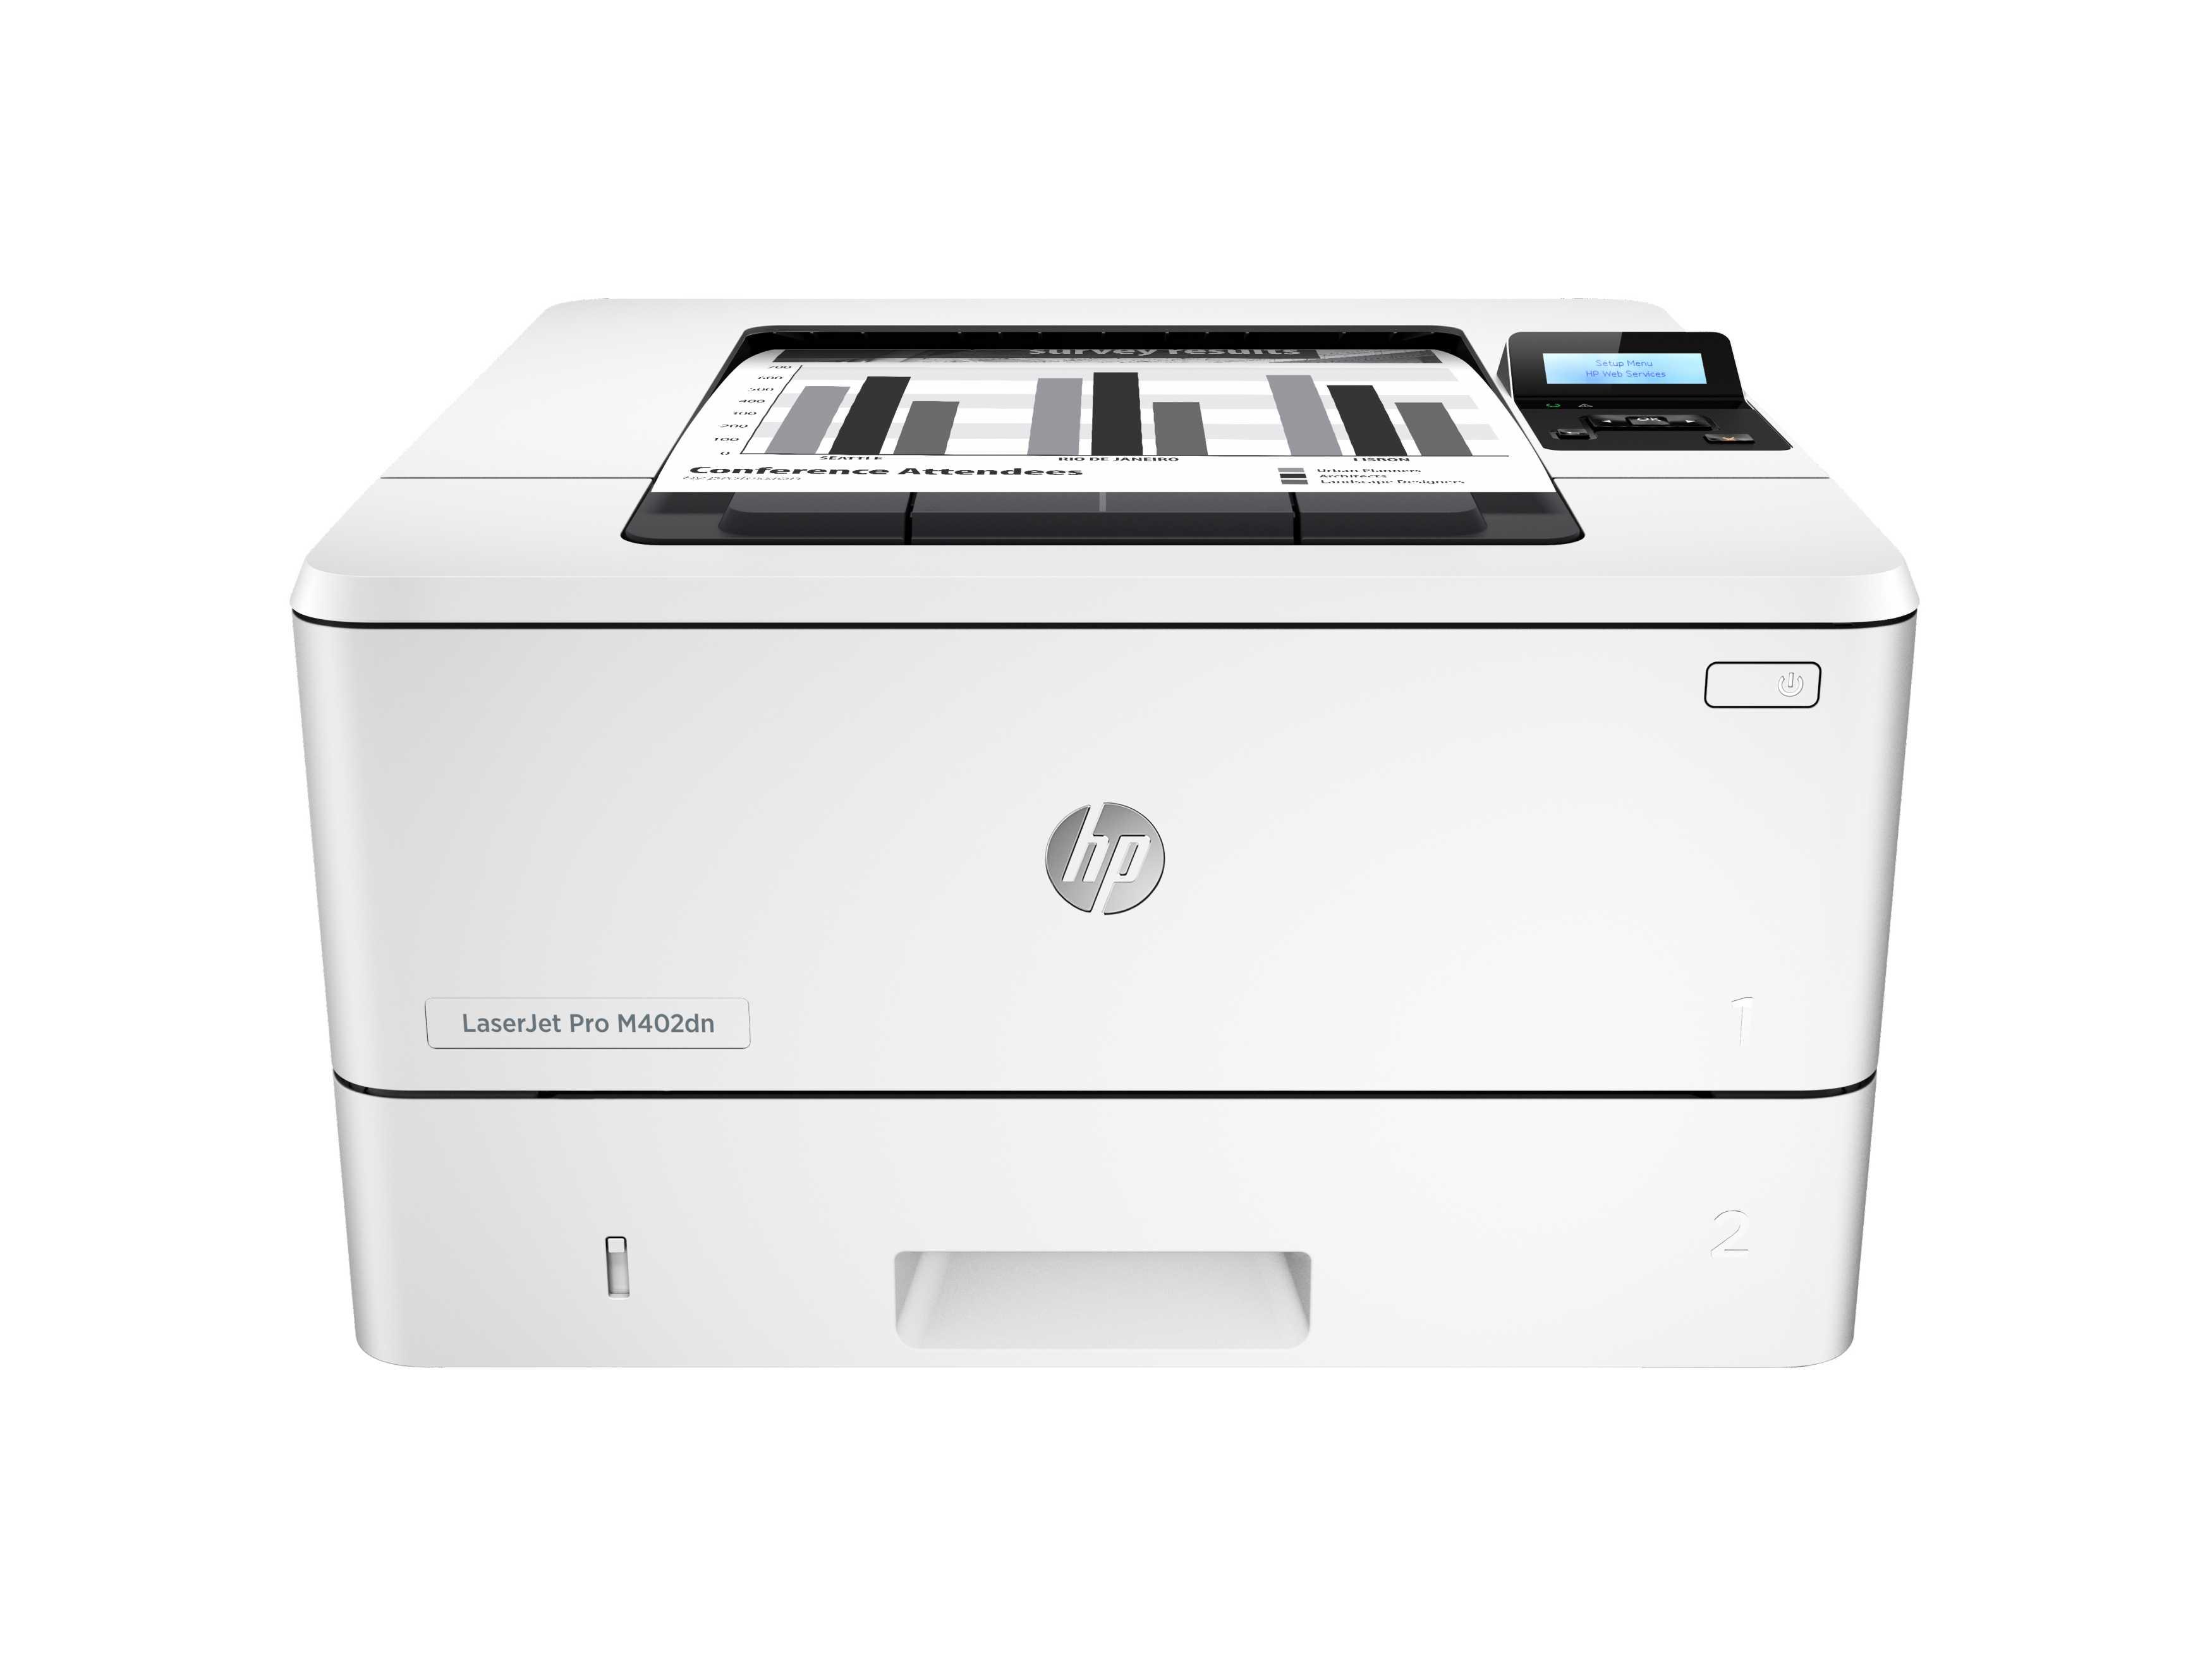 Impresora HP LaserJet Pro M402dn